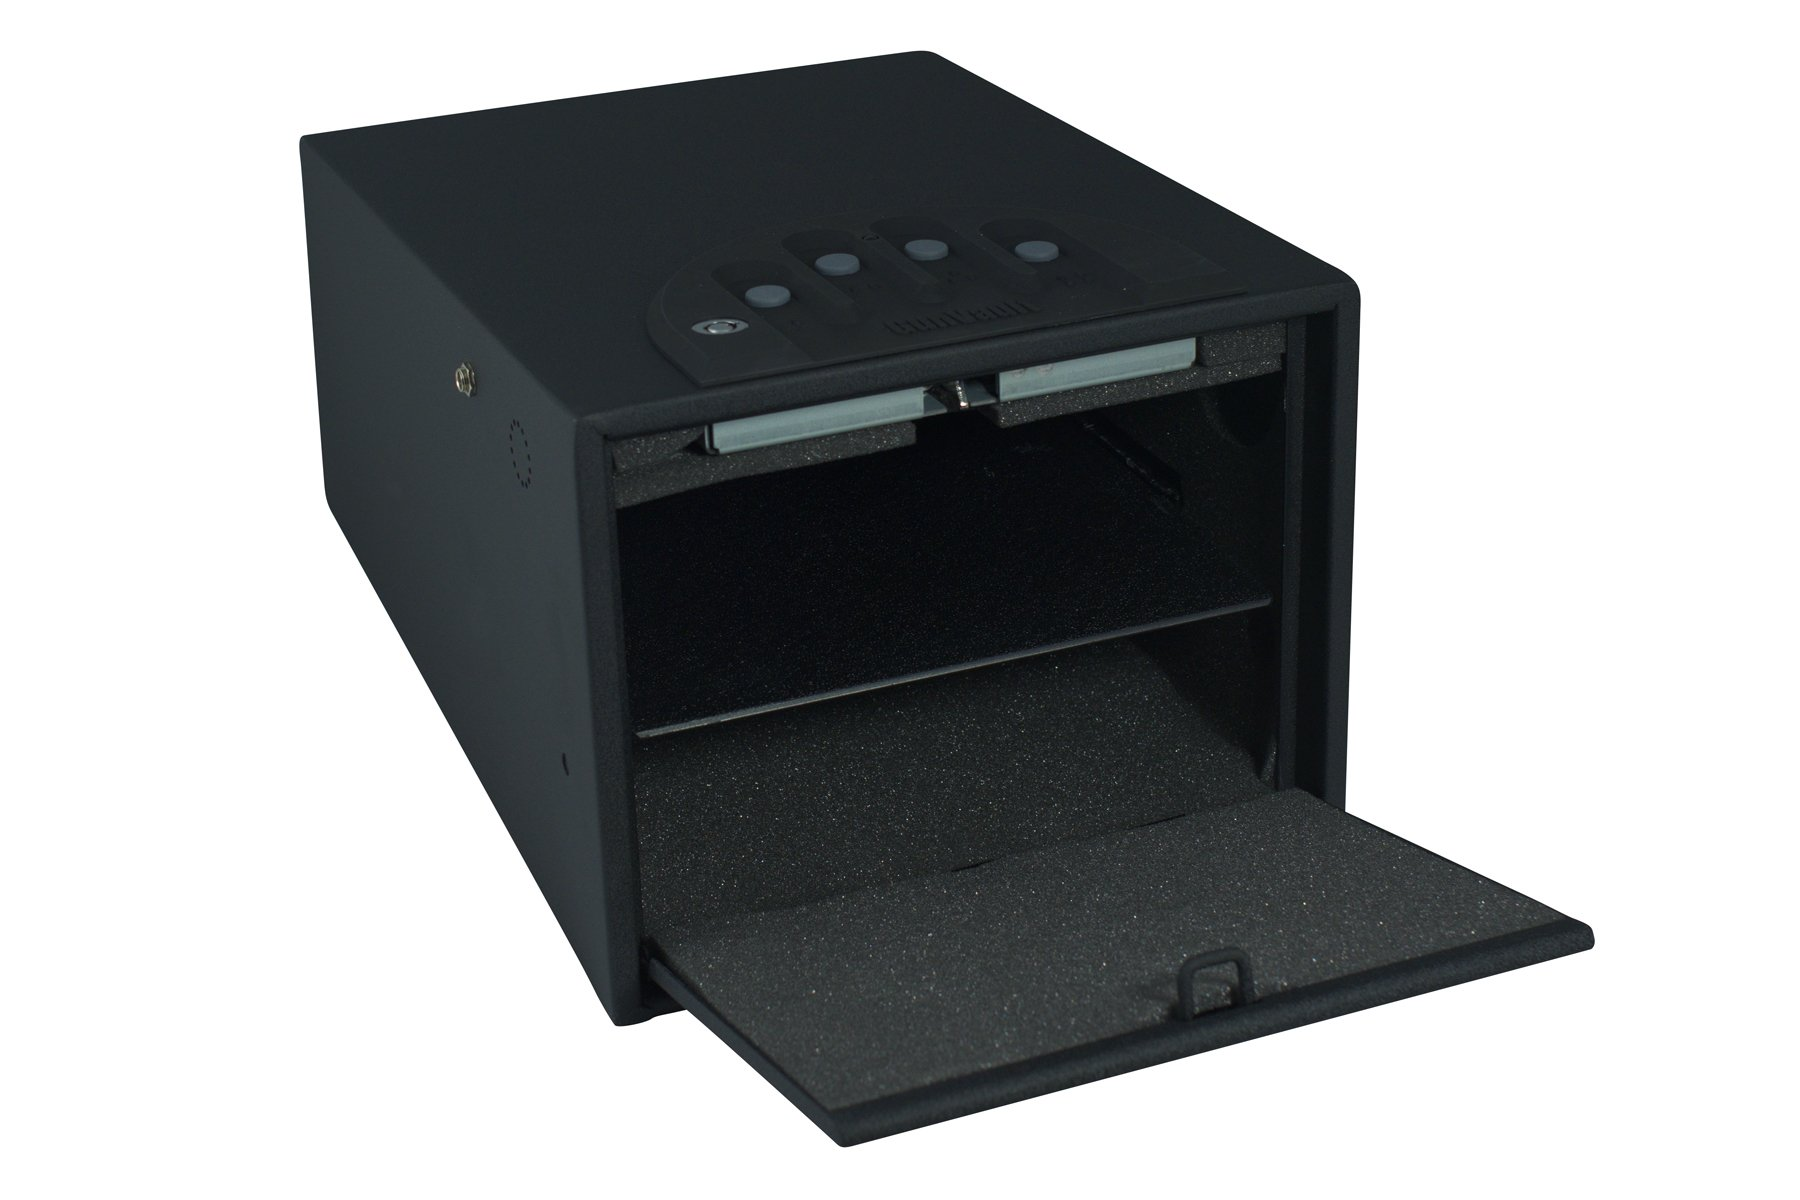 GunVault Deluxe Multi Vault Safe, 14'' x 10'' x 8'', Black